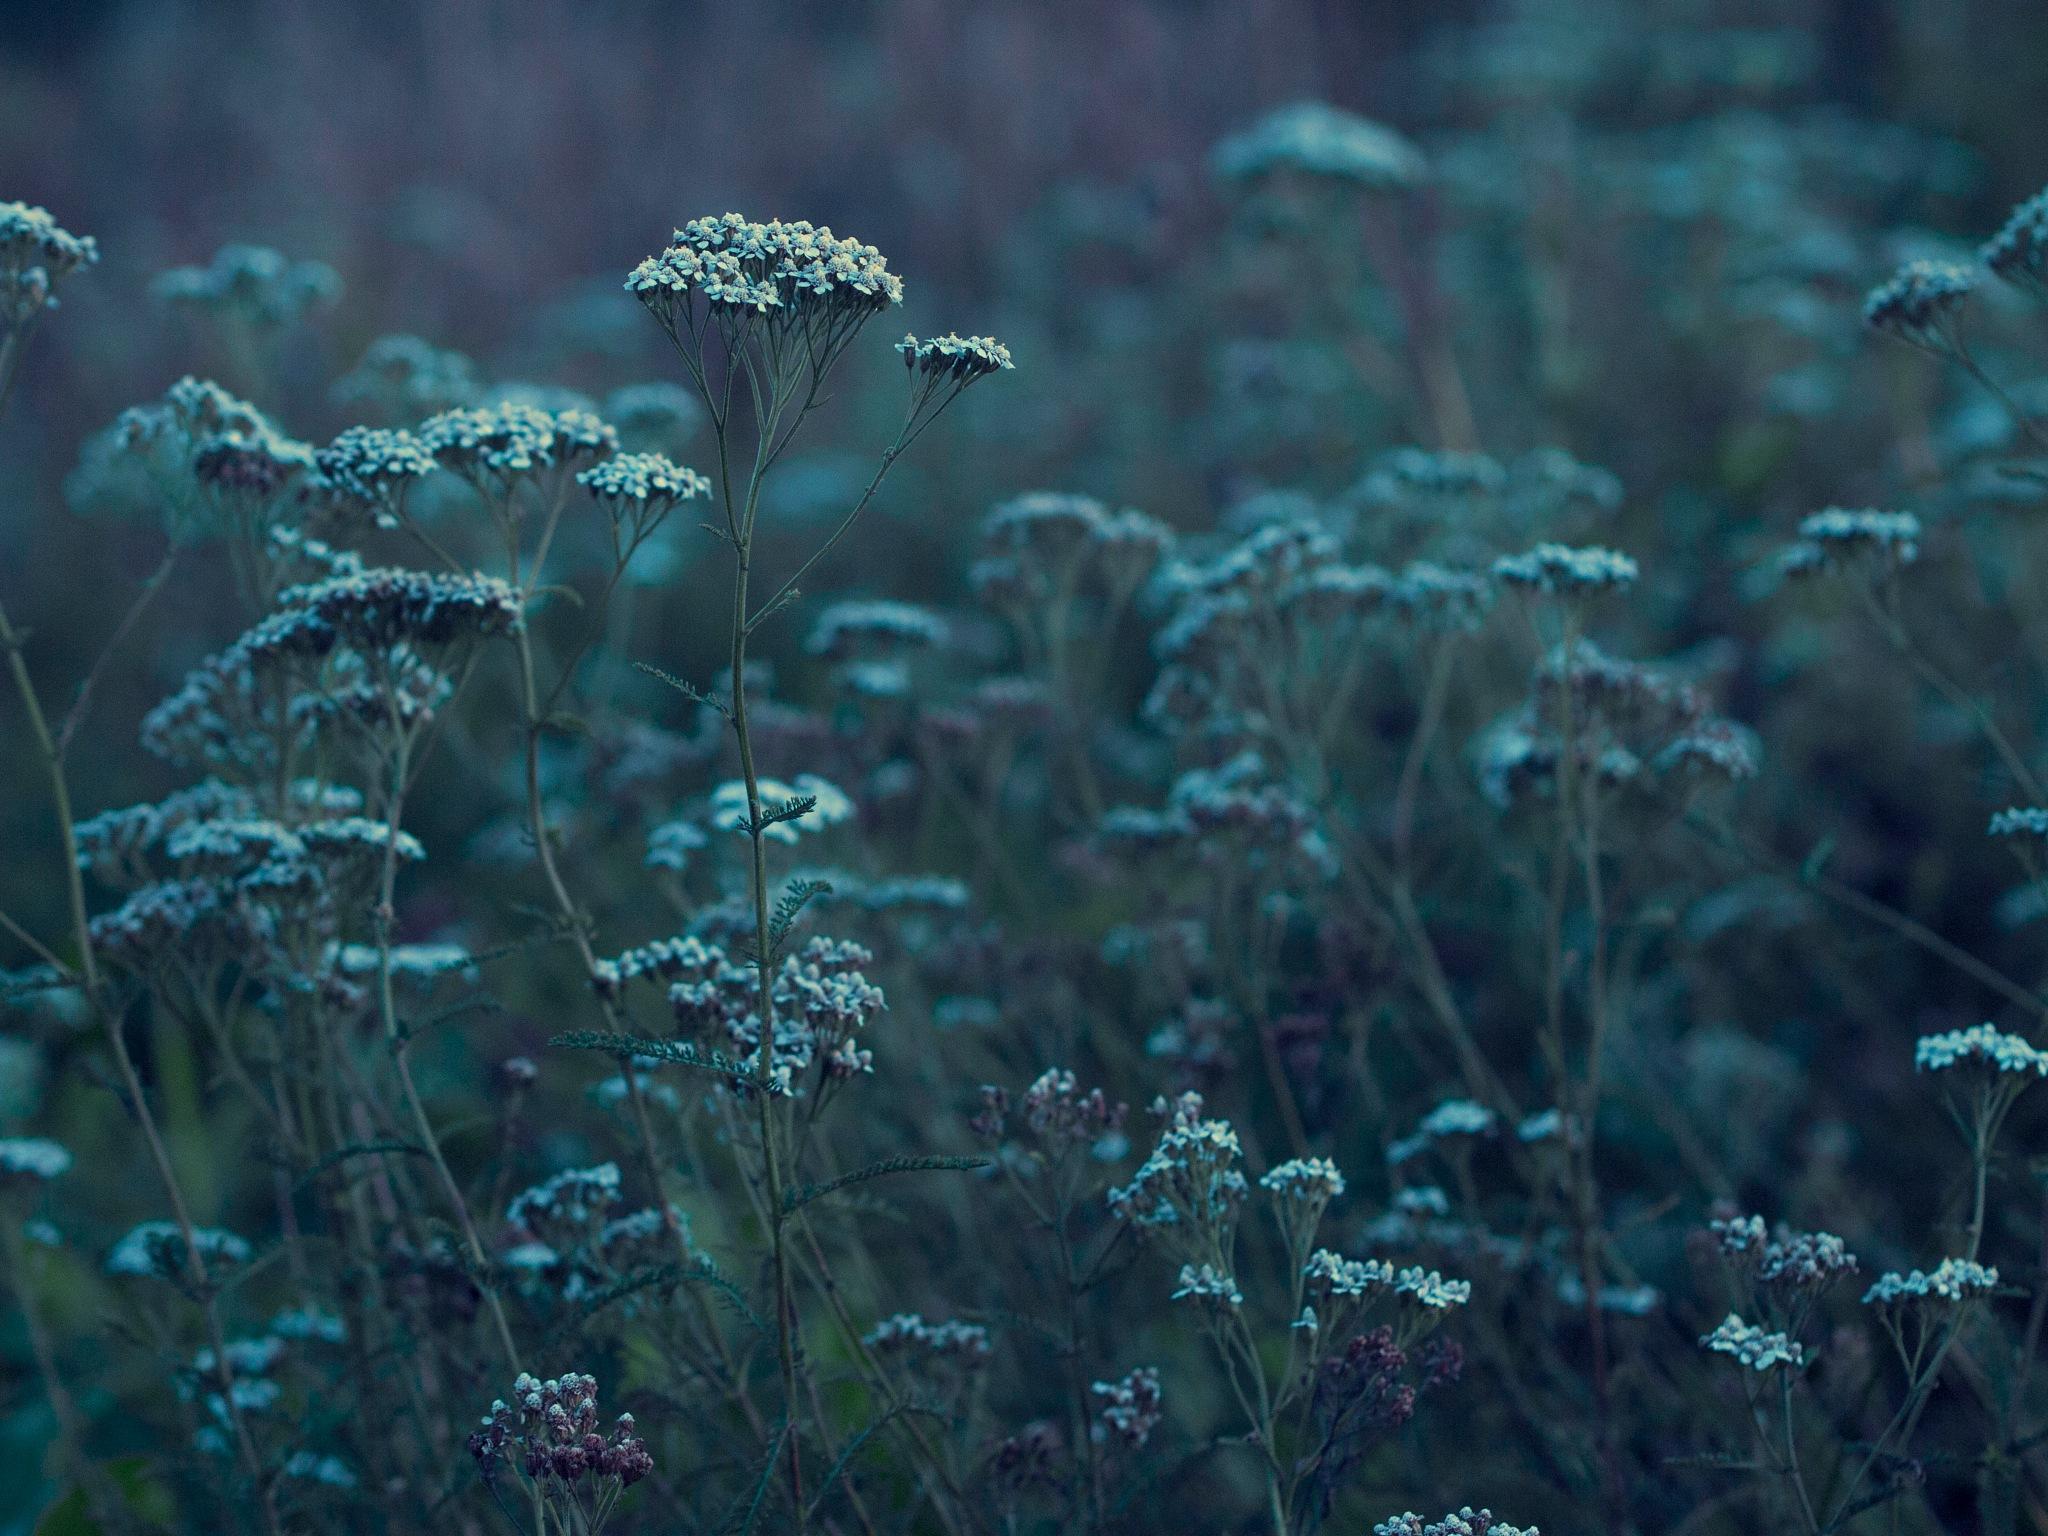 wild flowers by mcajan